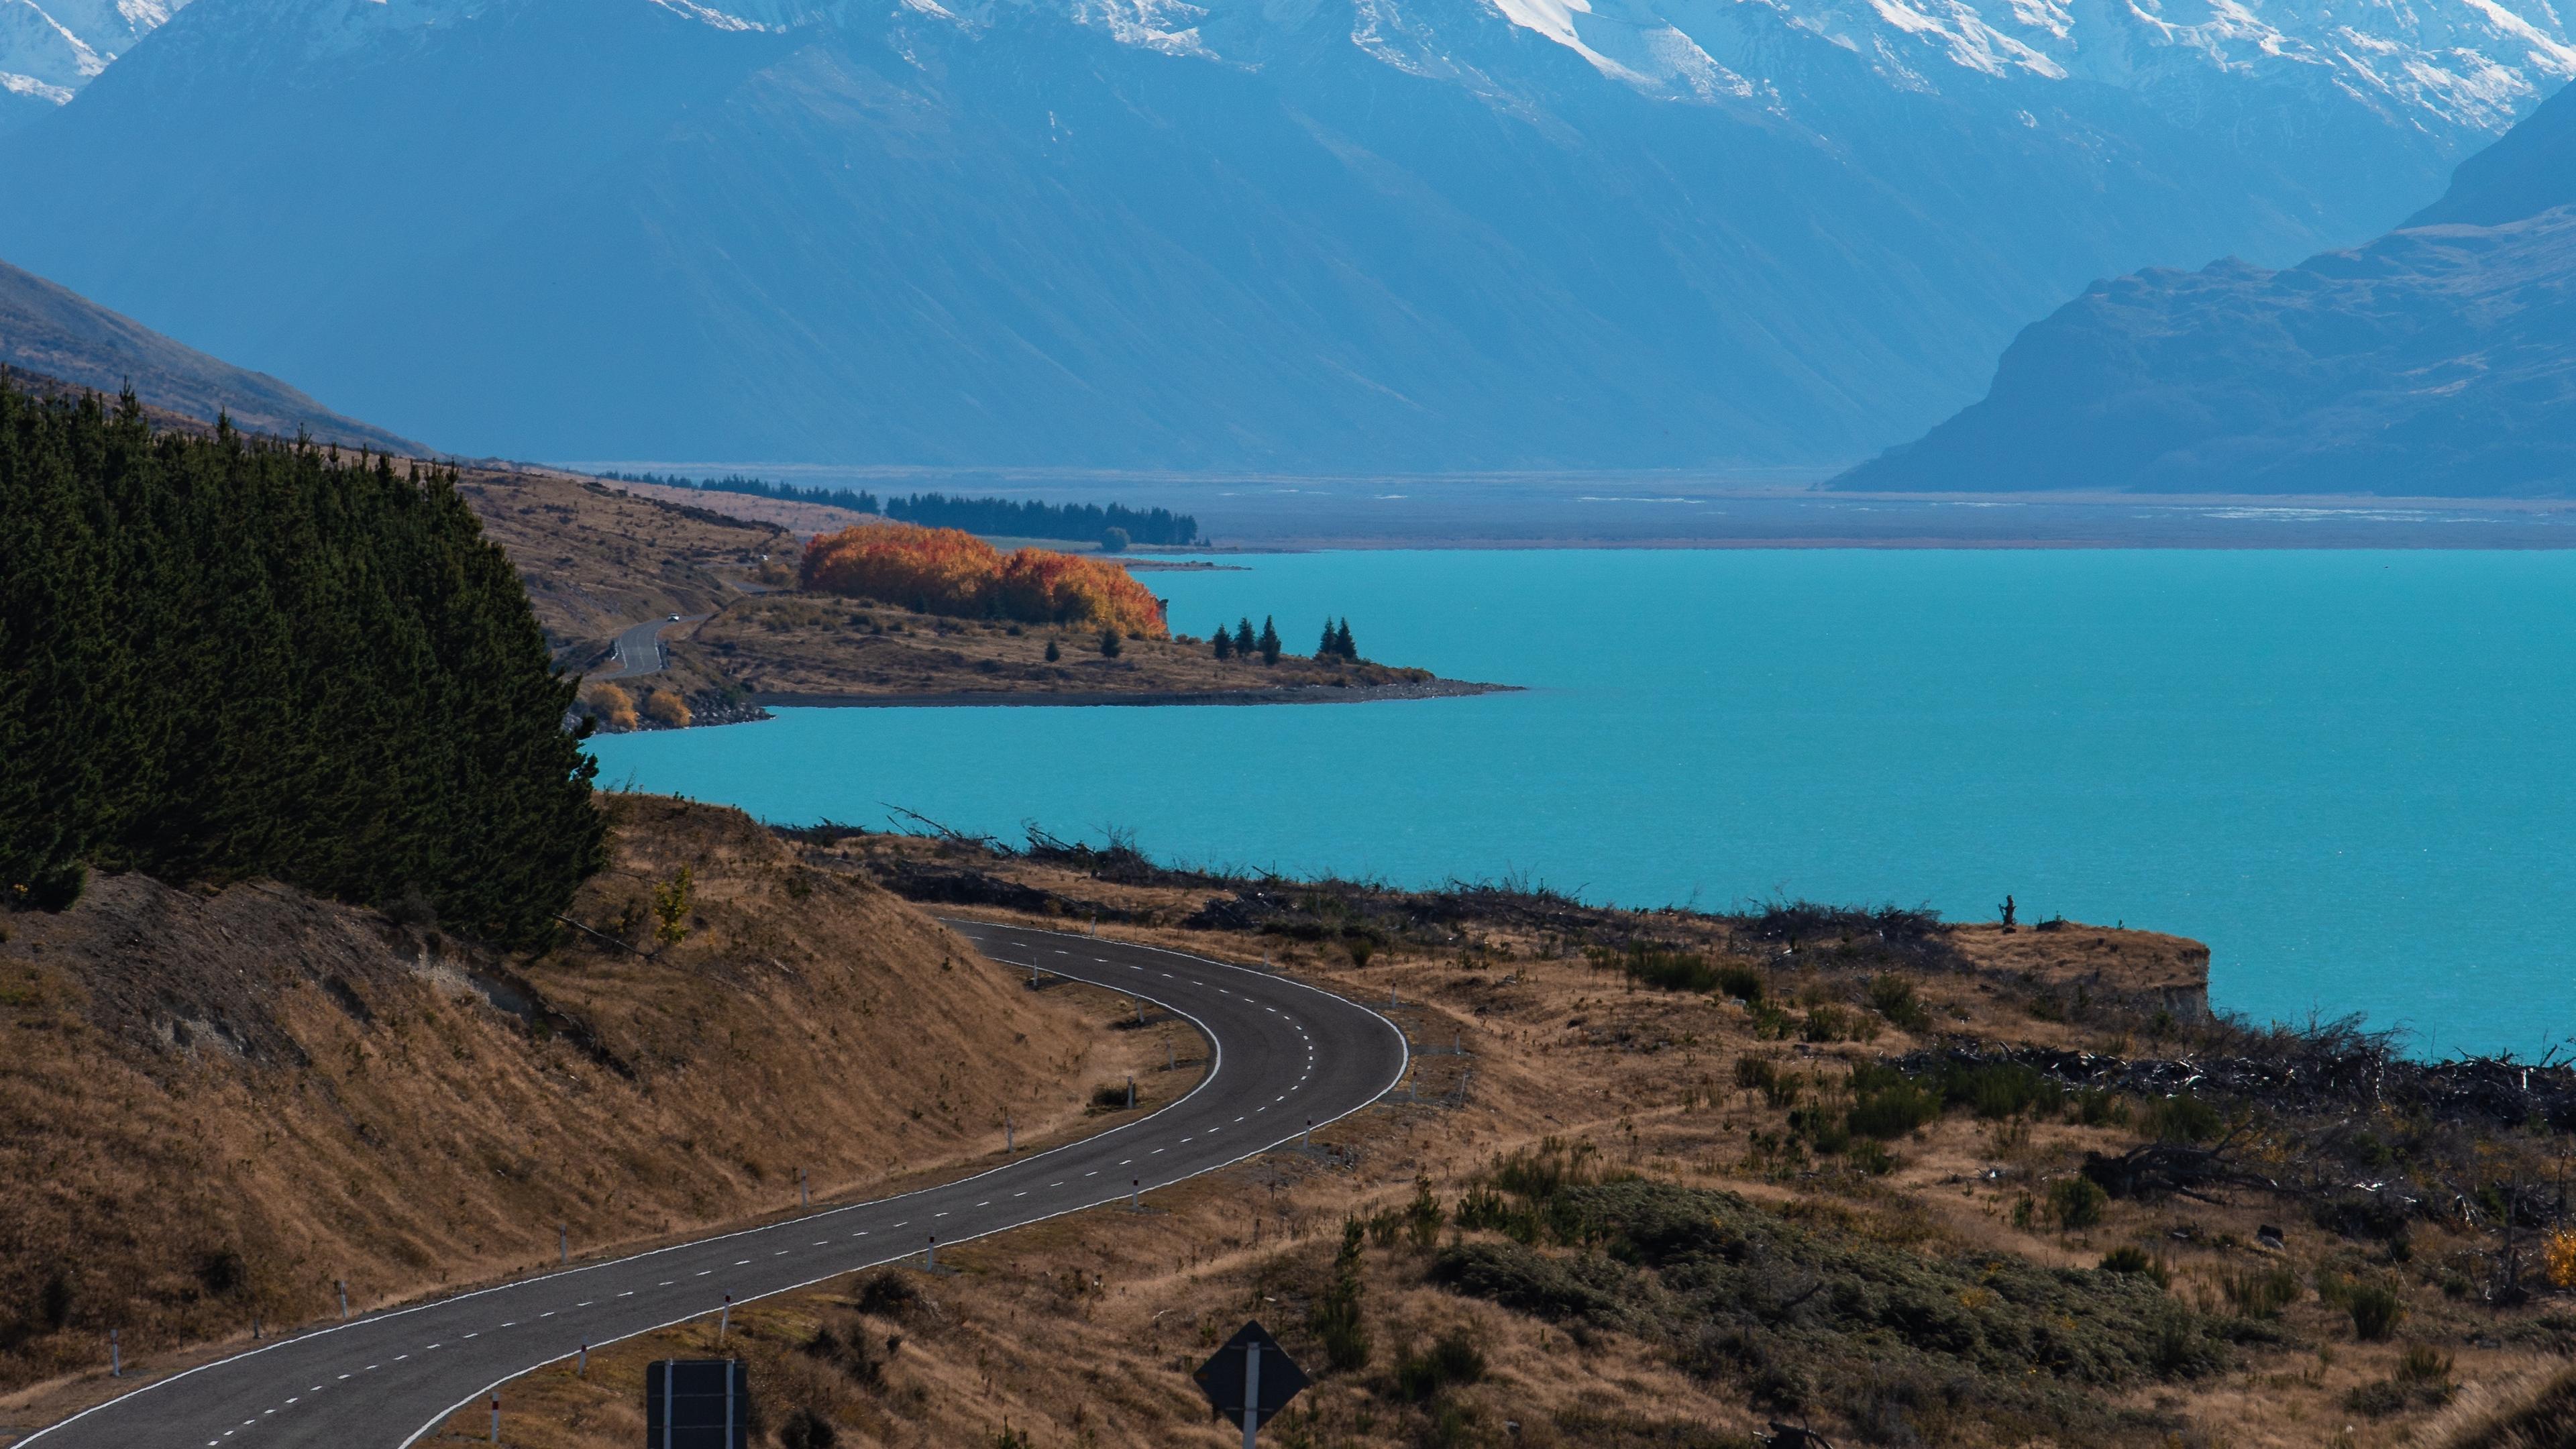 lake pukaki new zealand road mountains turn 4k 1541115259 - lake pukaki, new zealand, road, mountains, turn 4k - Road, new zealand, lake pukaki